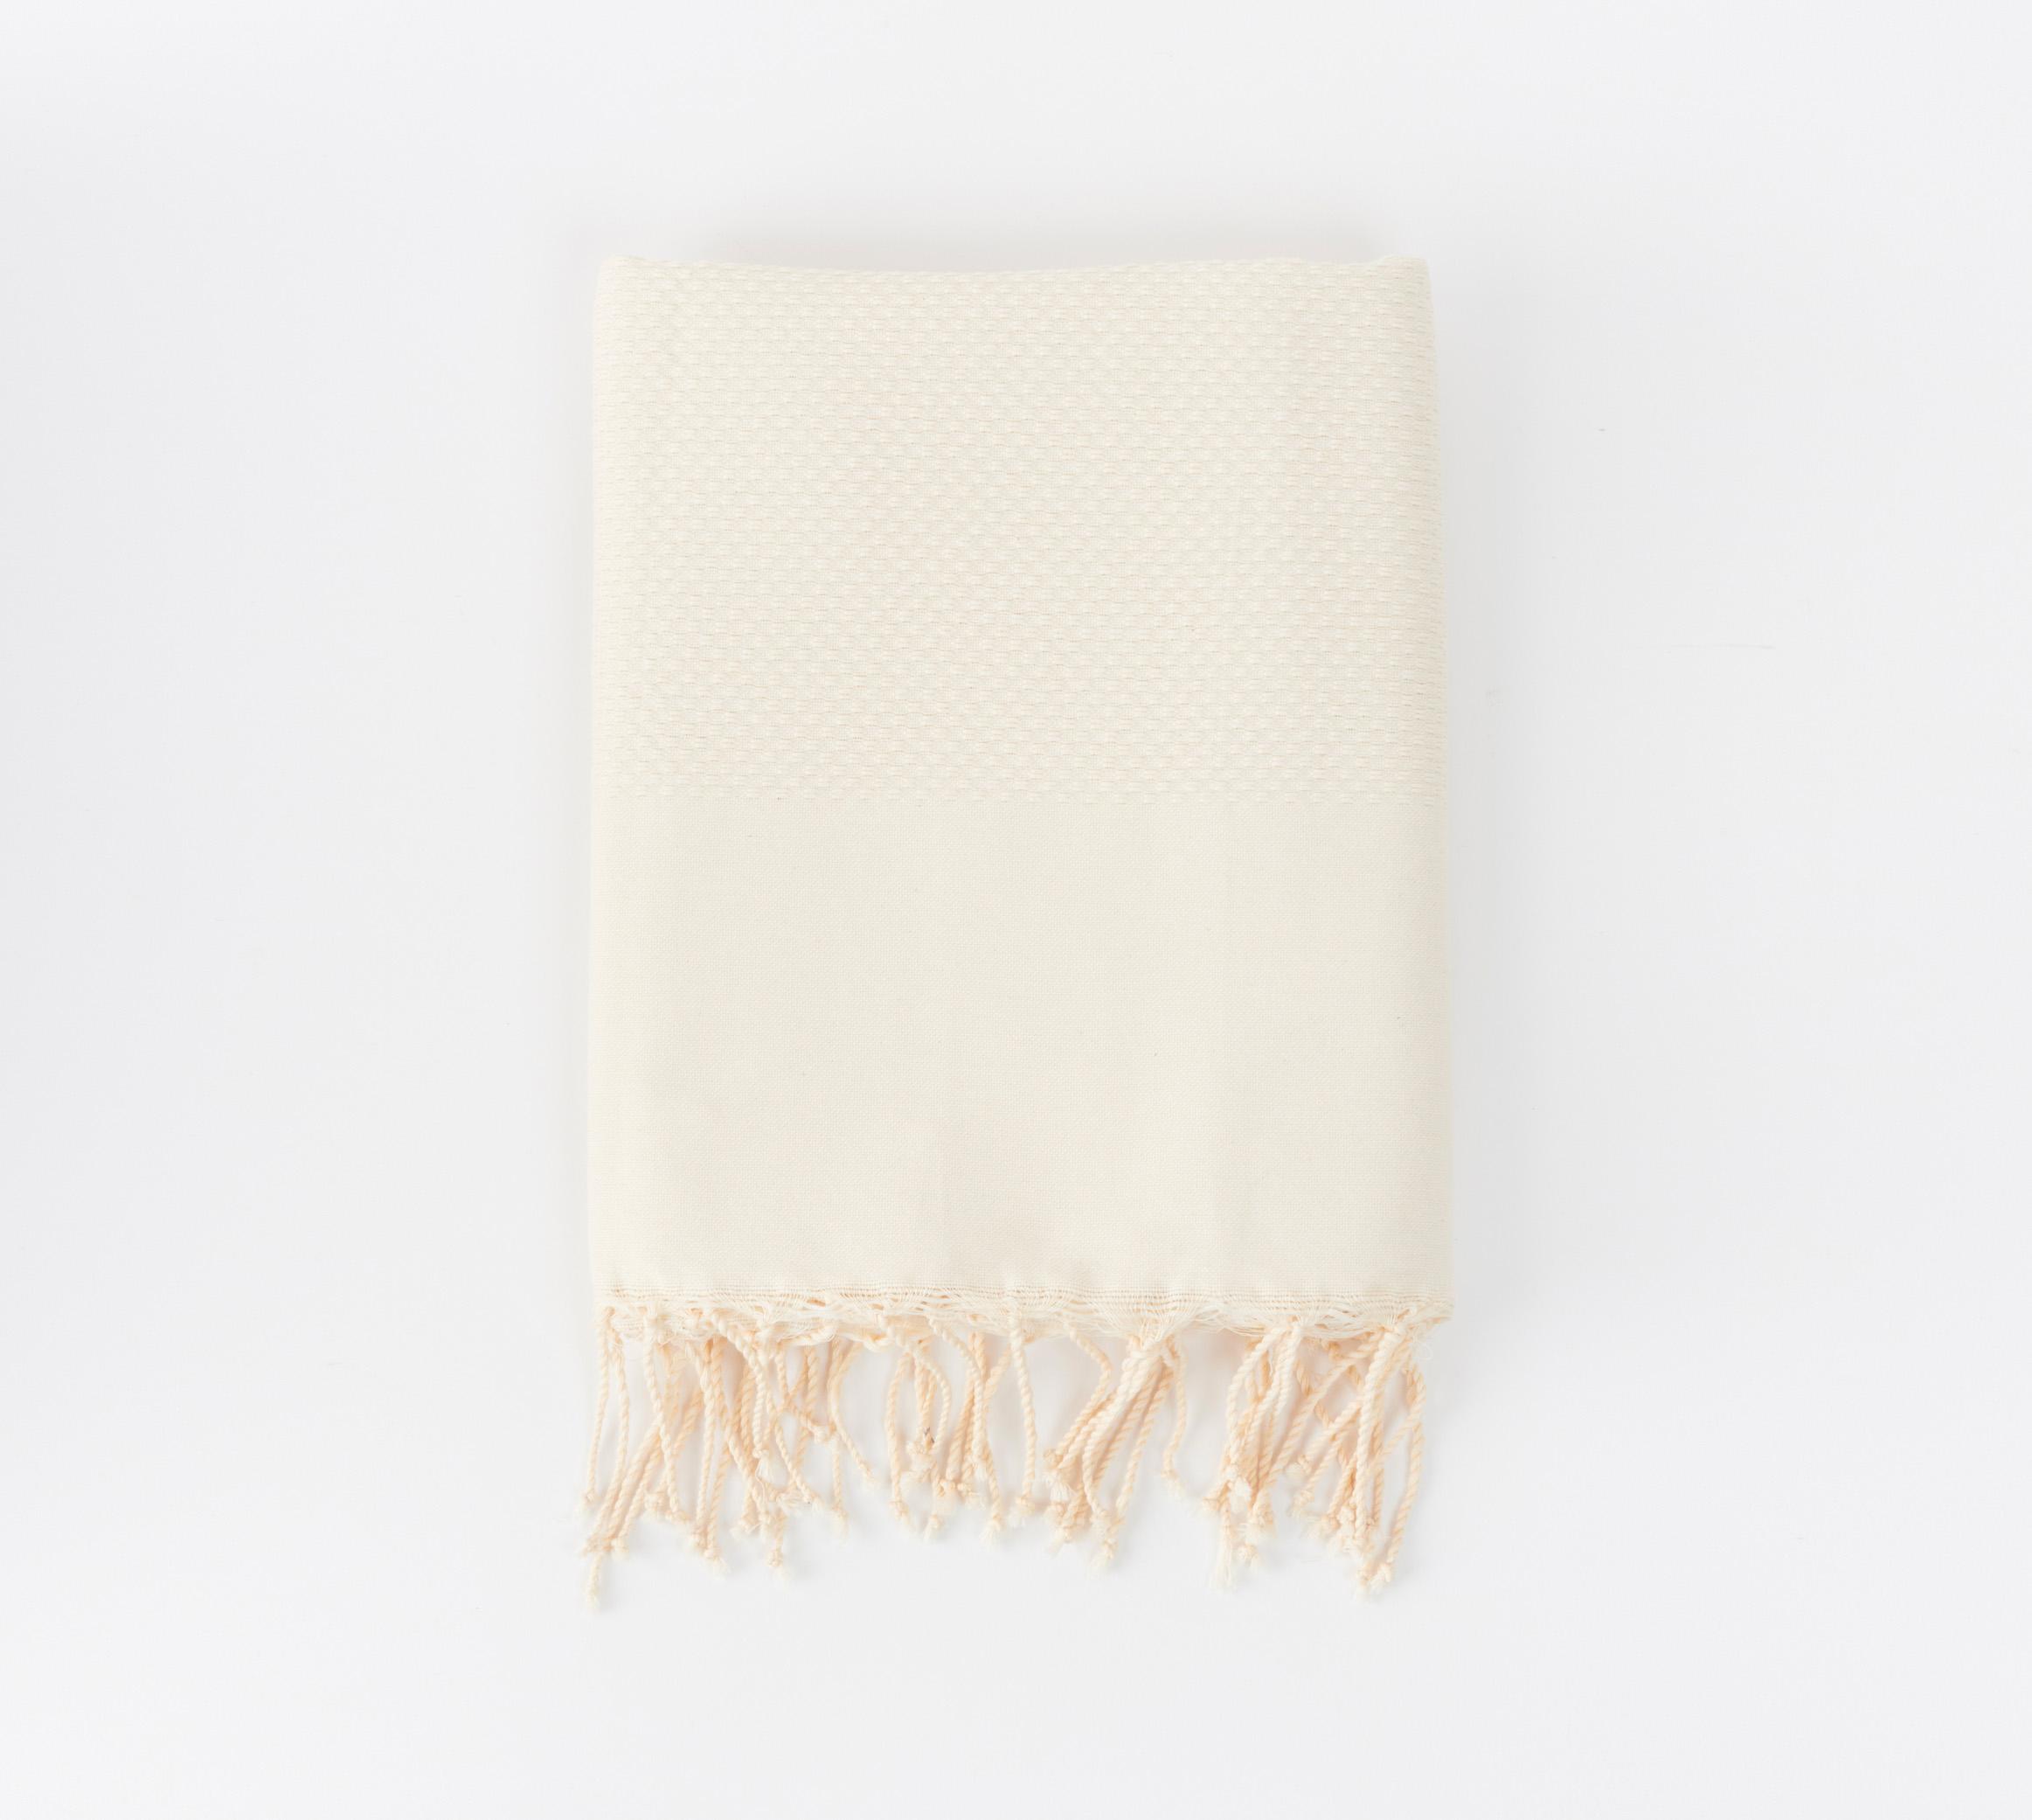 Senda Fouta Towel in Jasmine White